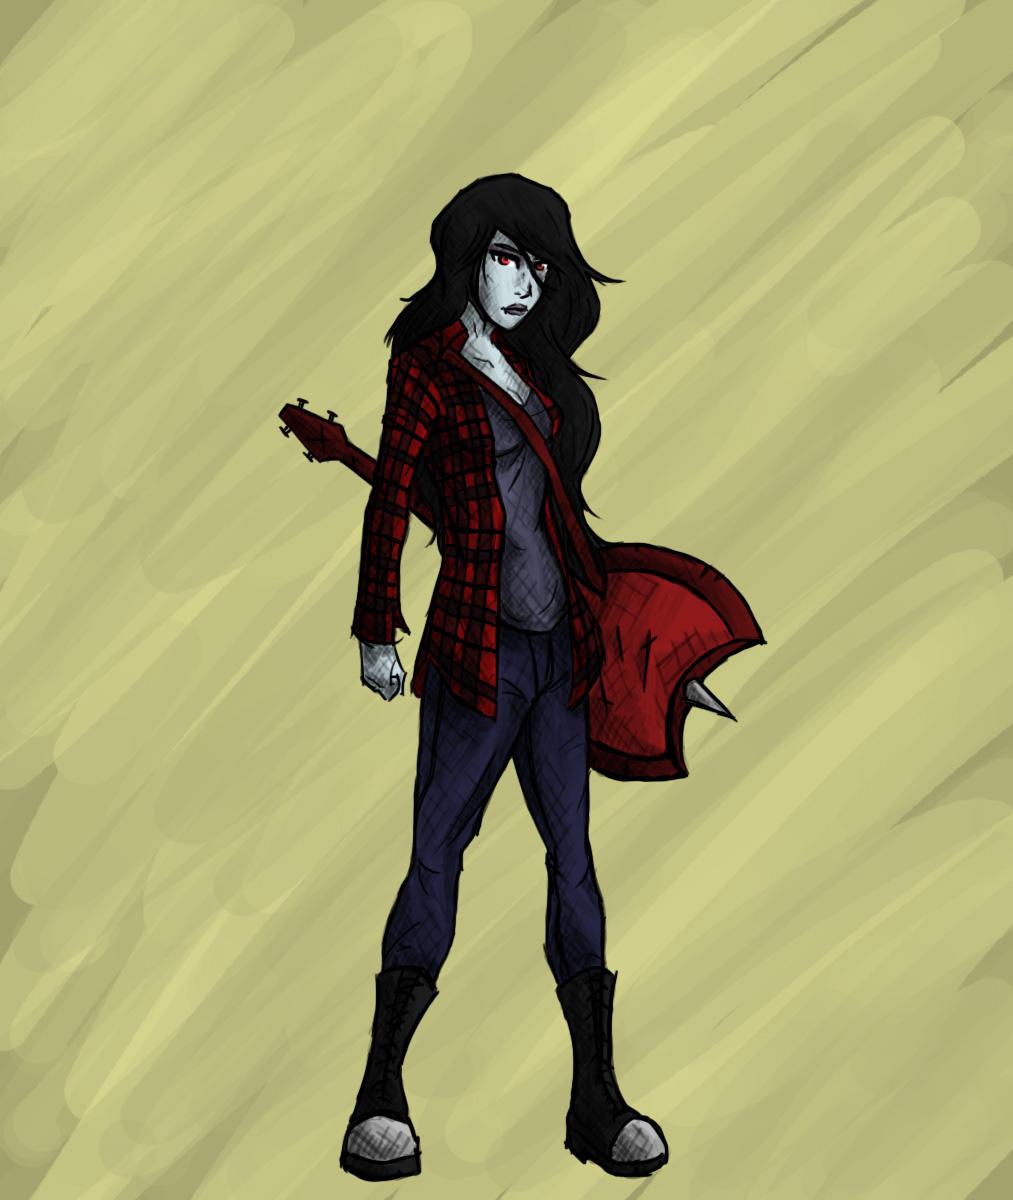 Marceline the Vampire Queen by ArmandDj on DeviantArt